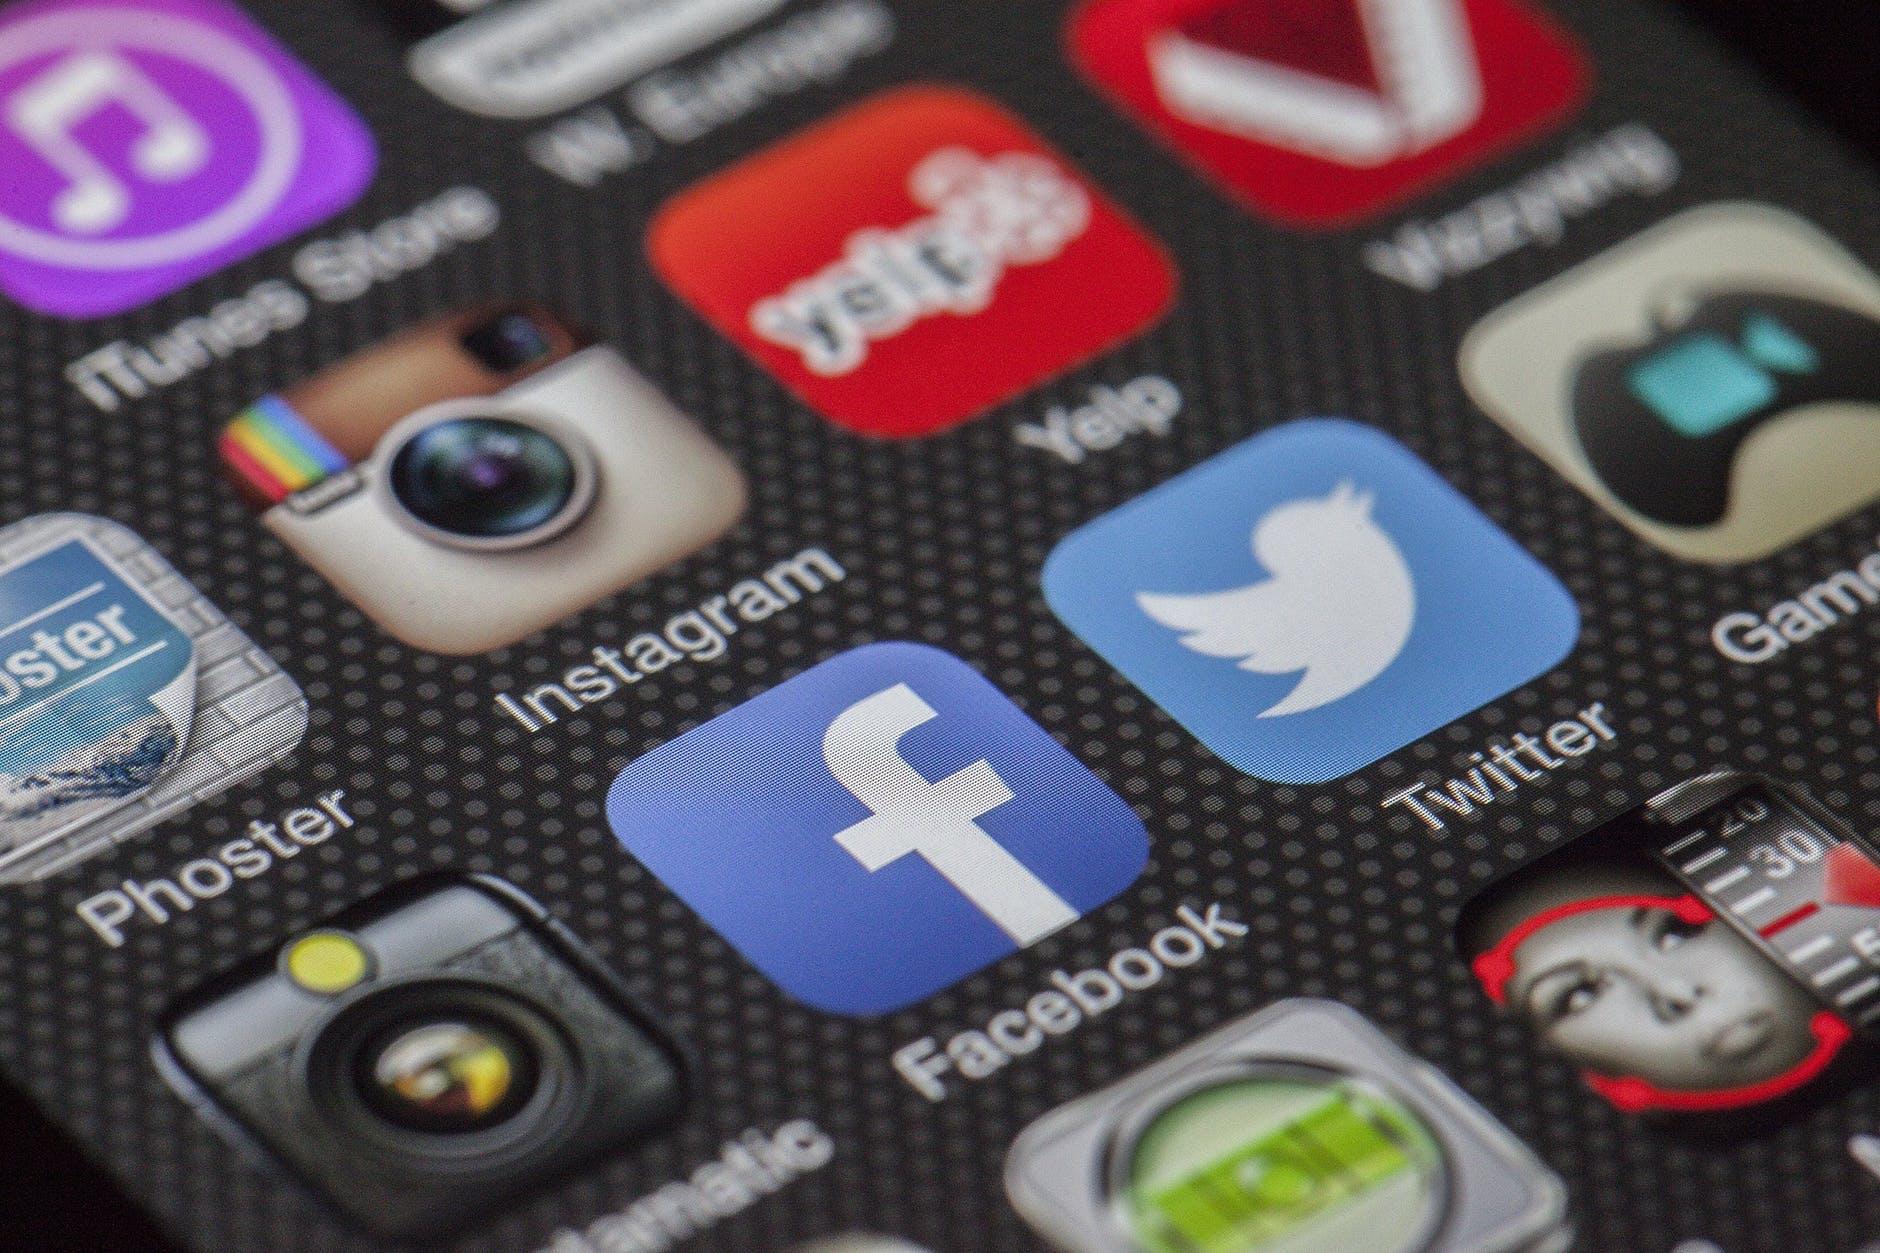 twitter-facebook-together-exchange-of-marketing